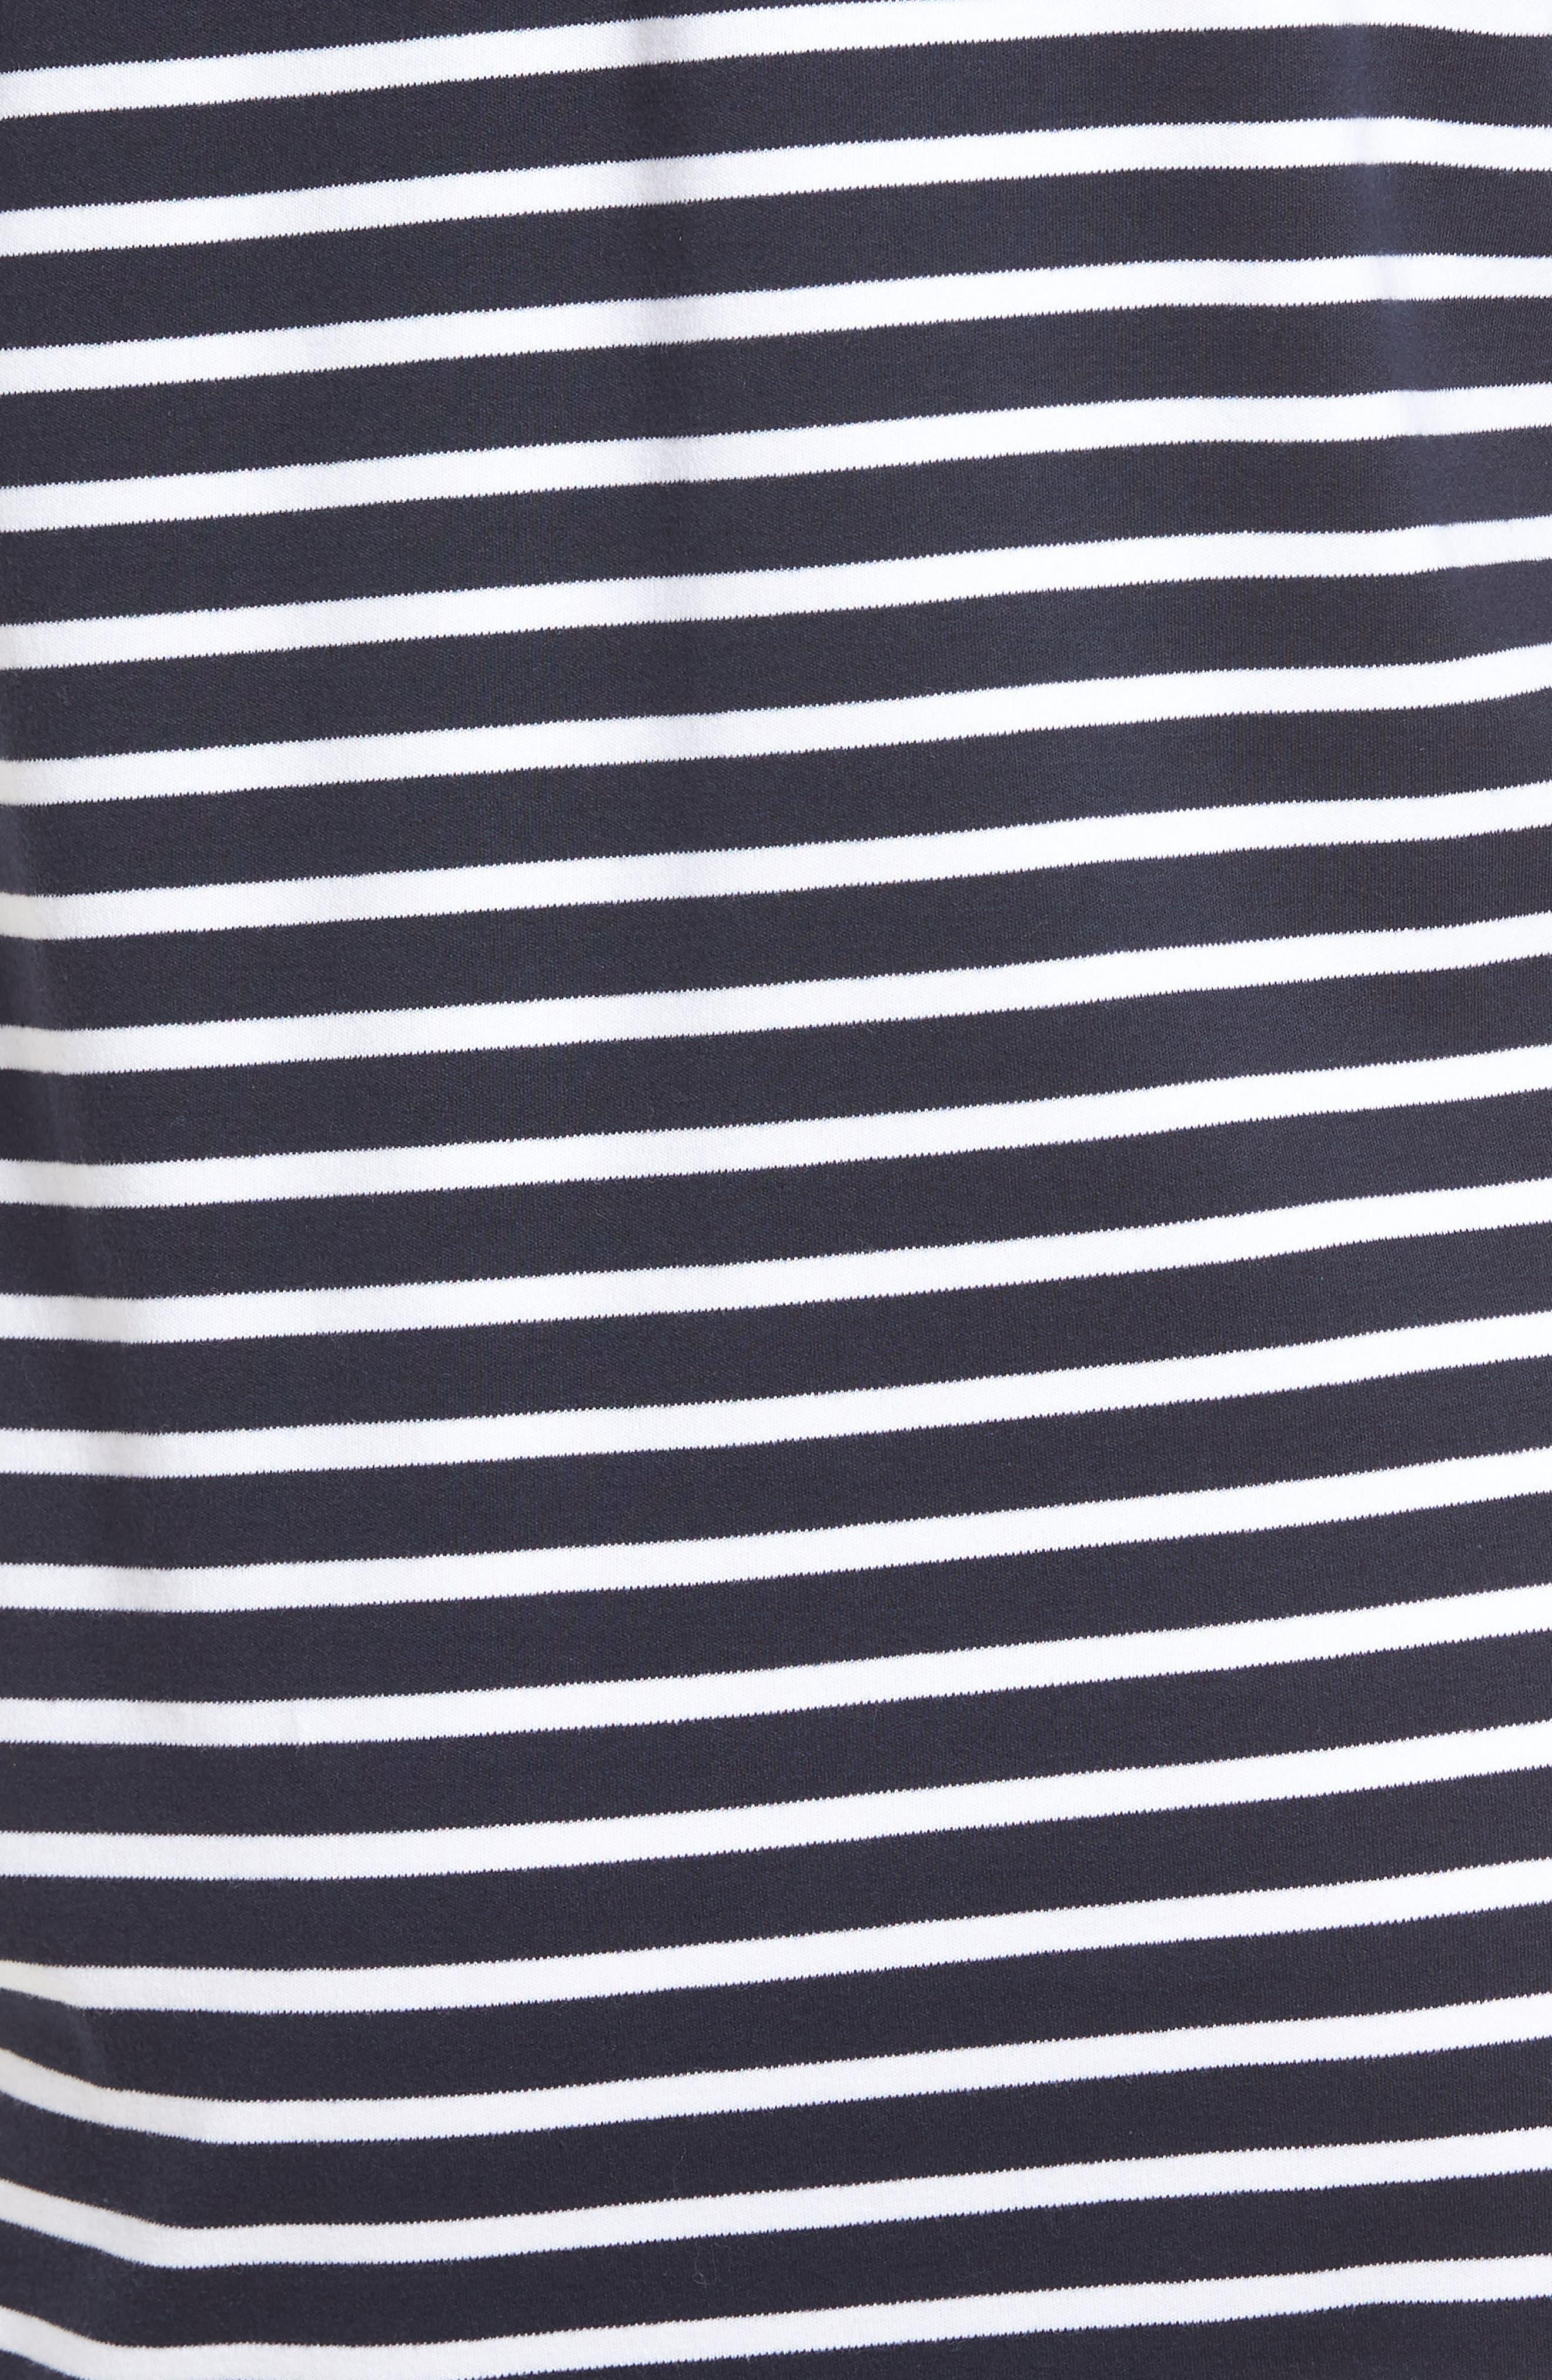 Bow Back Stripe Knit Dress,                             Alternate thumbnail 6, color,                             410